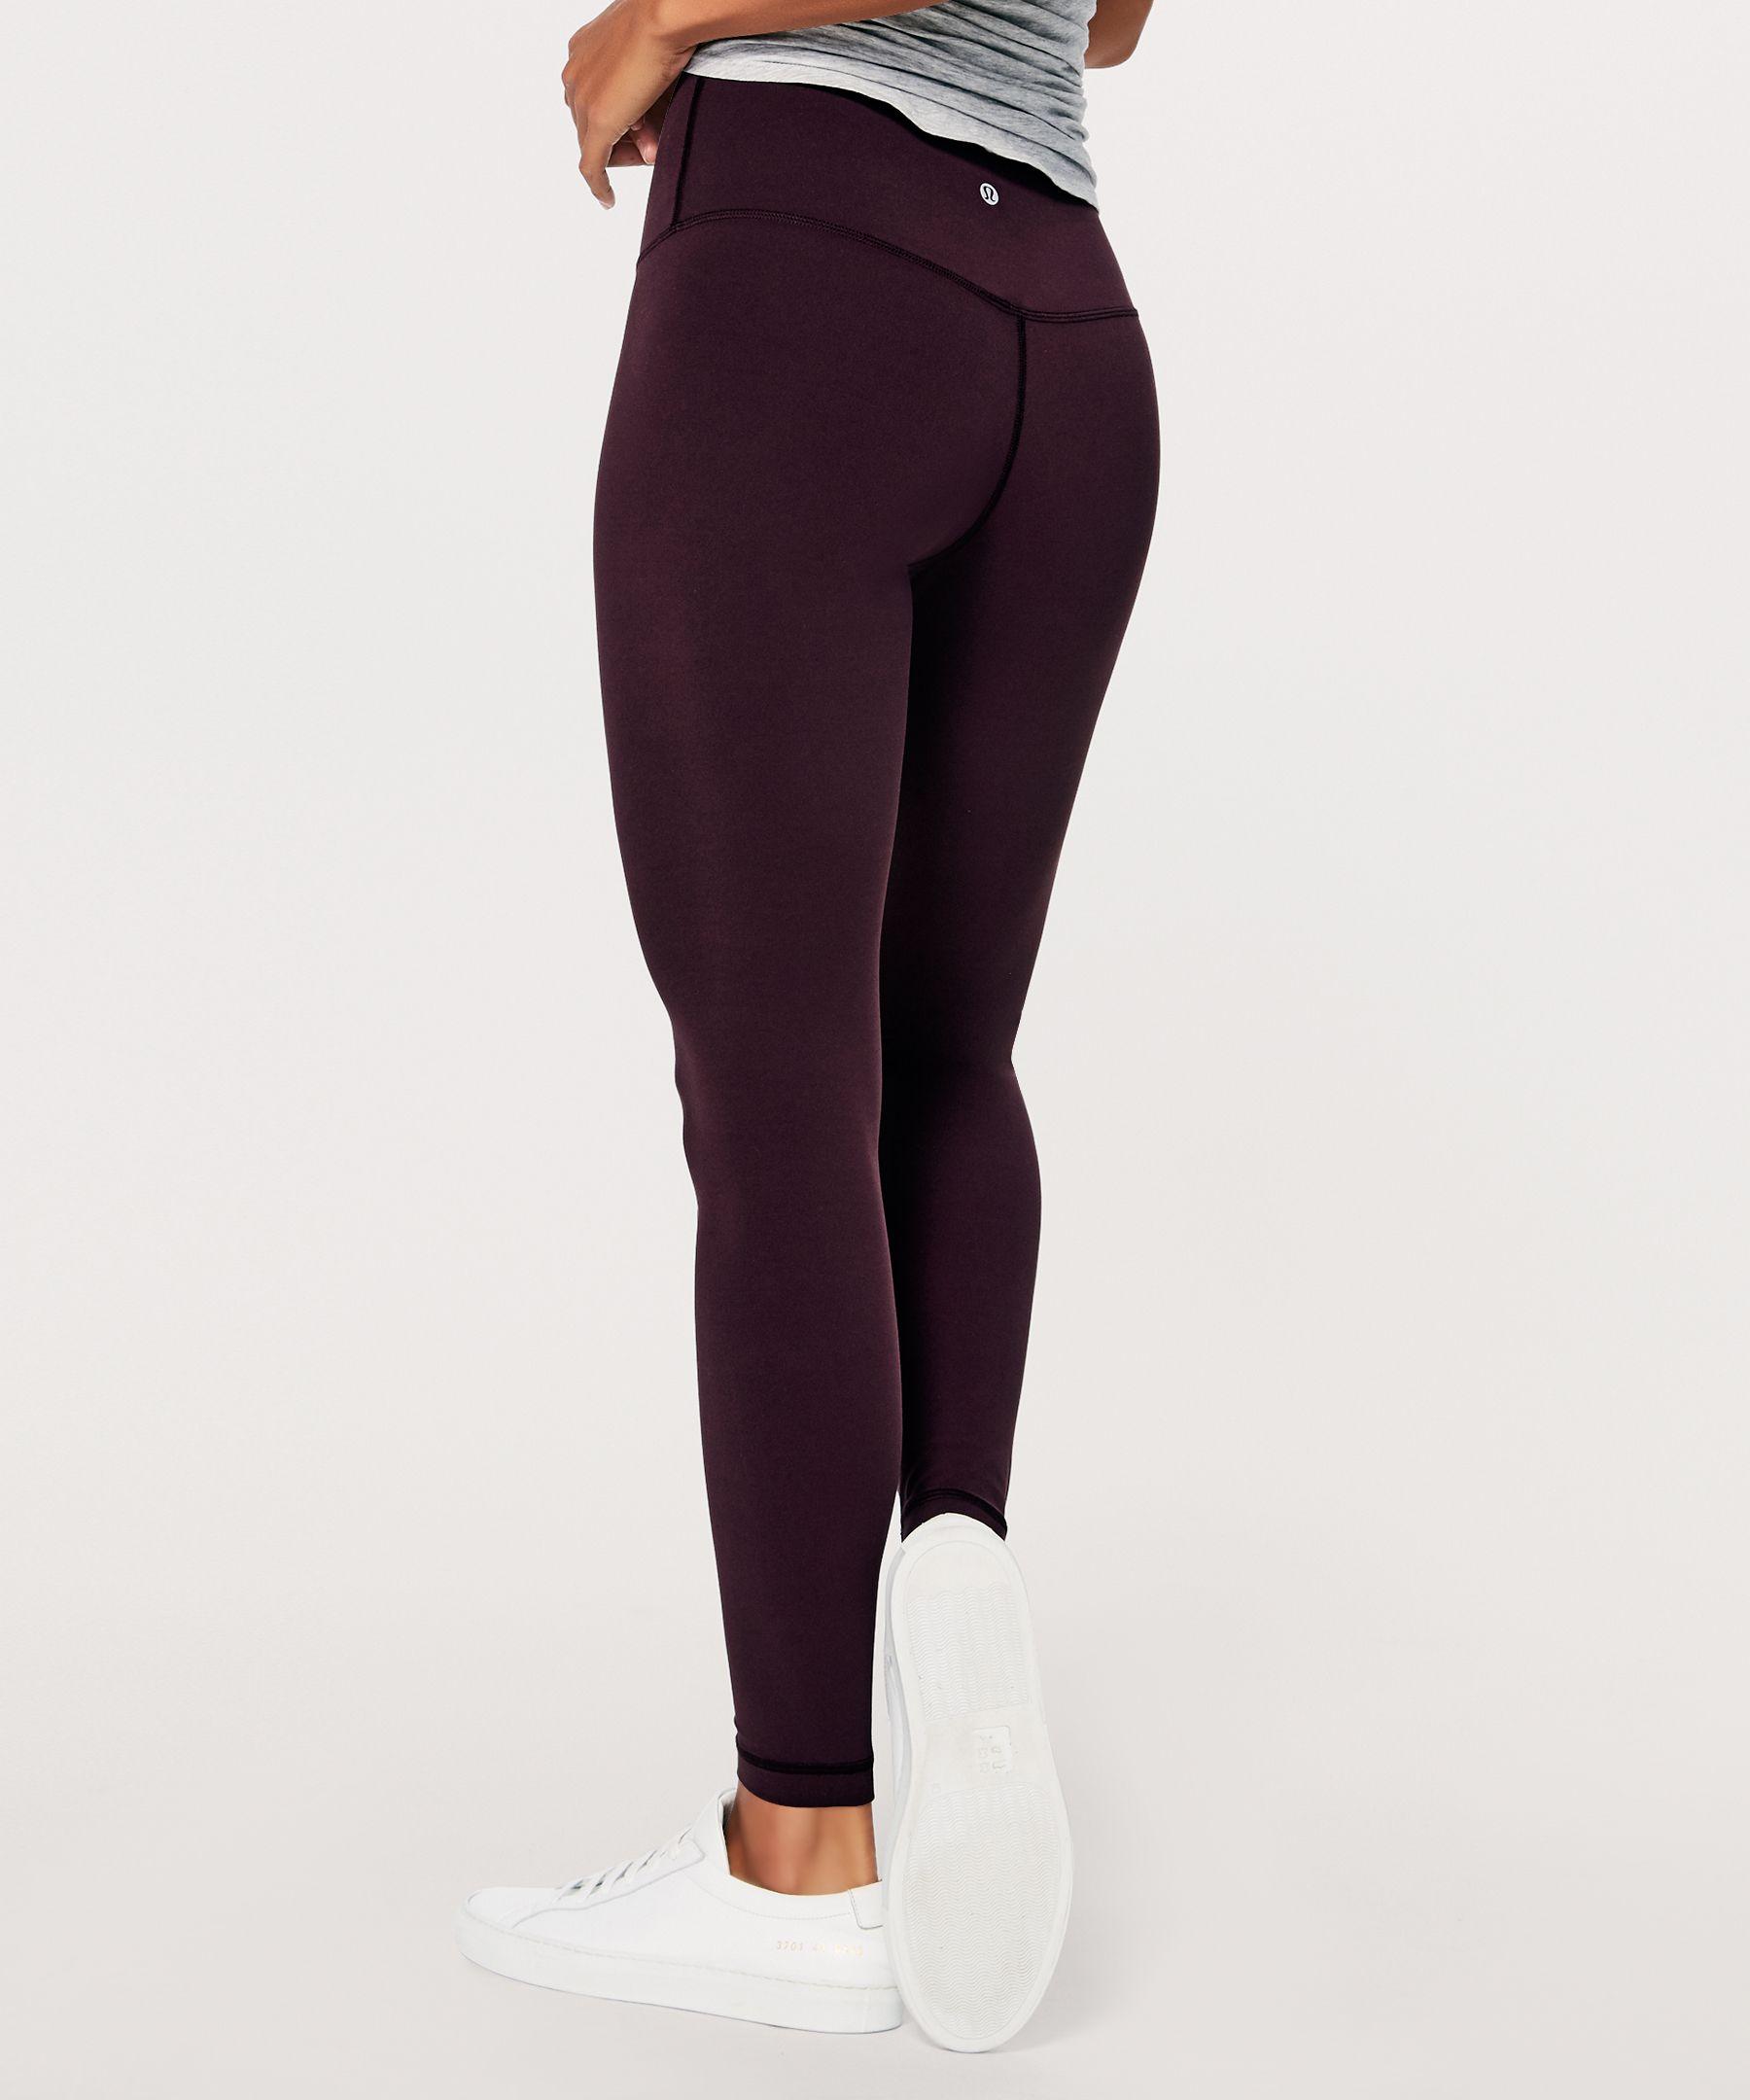 Align Pant 28 Women S Pants Lululemon